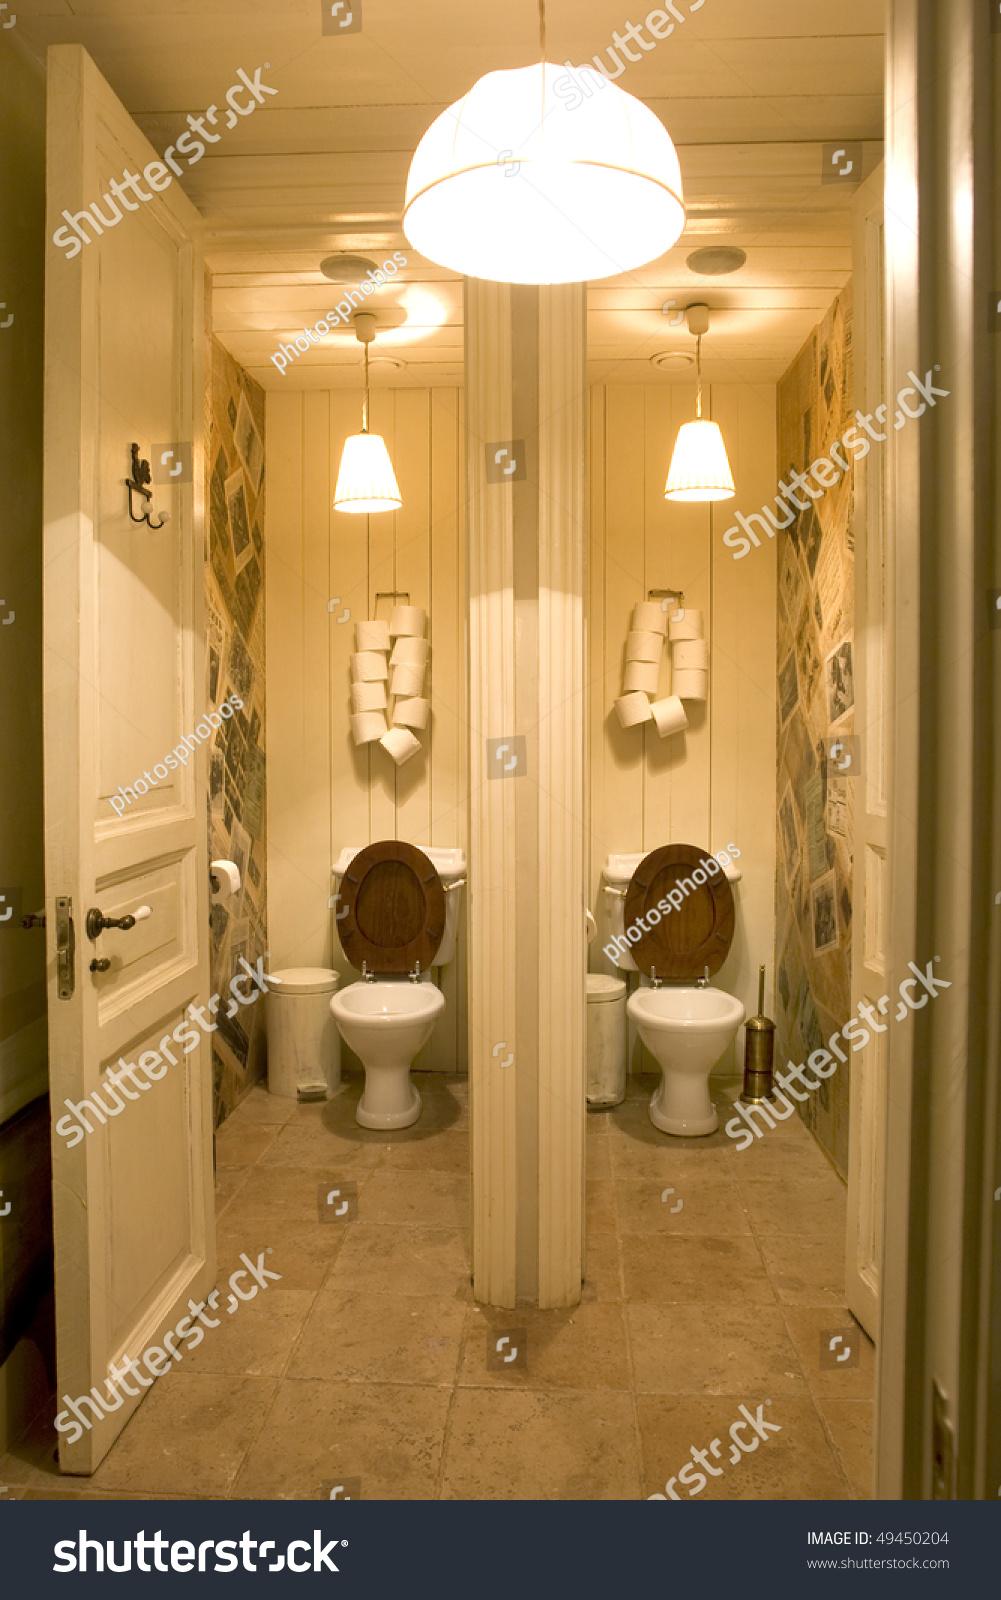 Bathroom Public Place Two Toilets Stock Photo (Edit Now) 49450204 ...